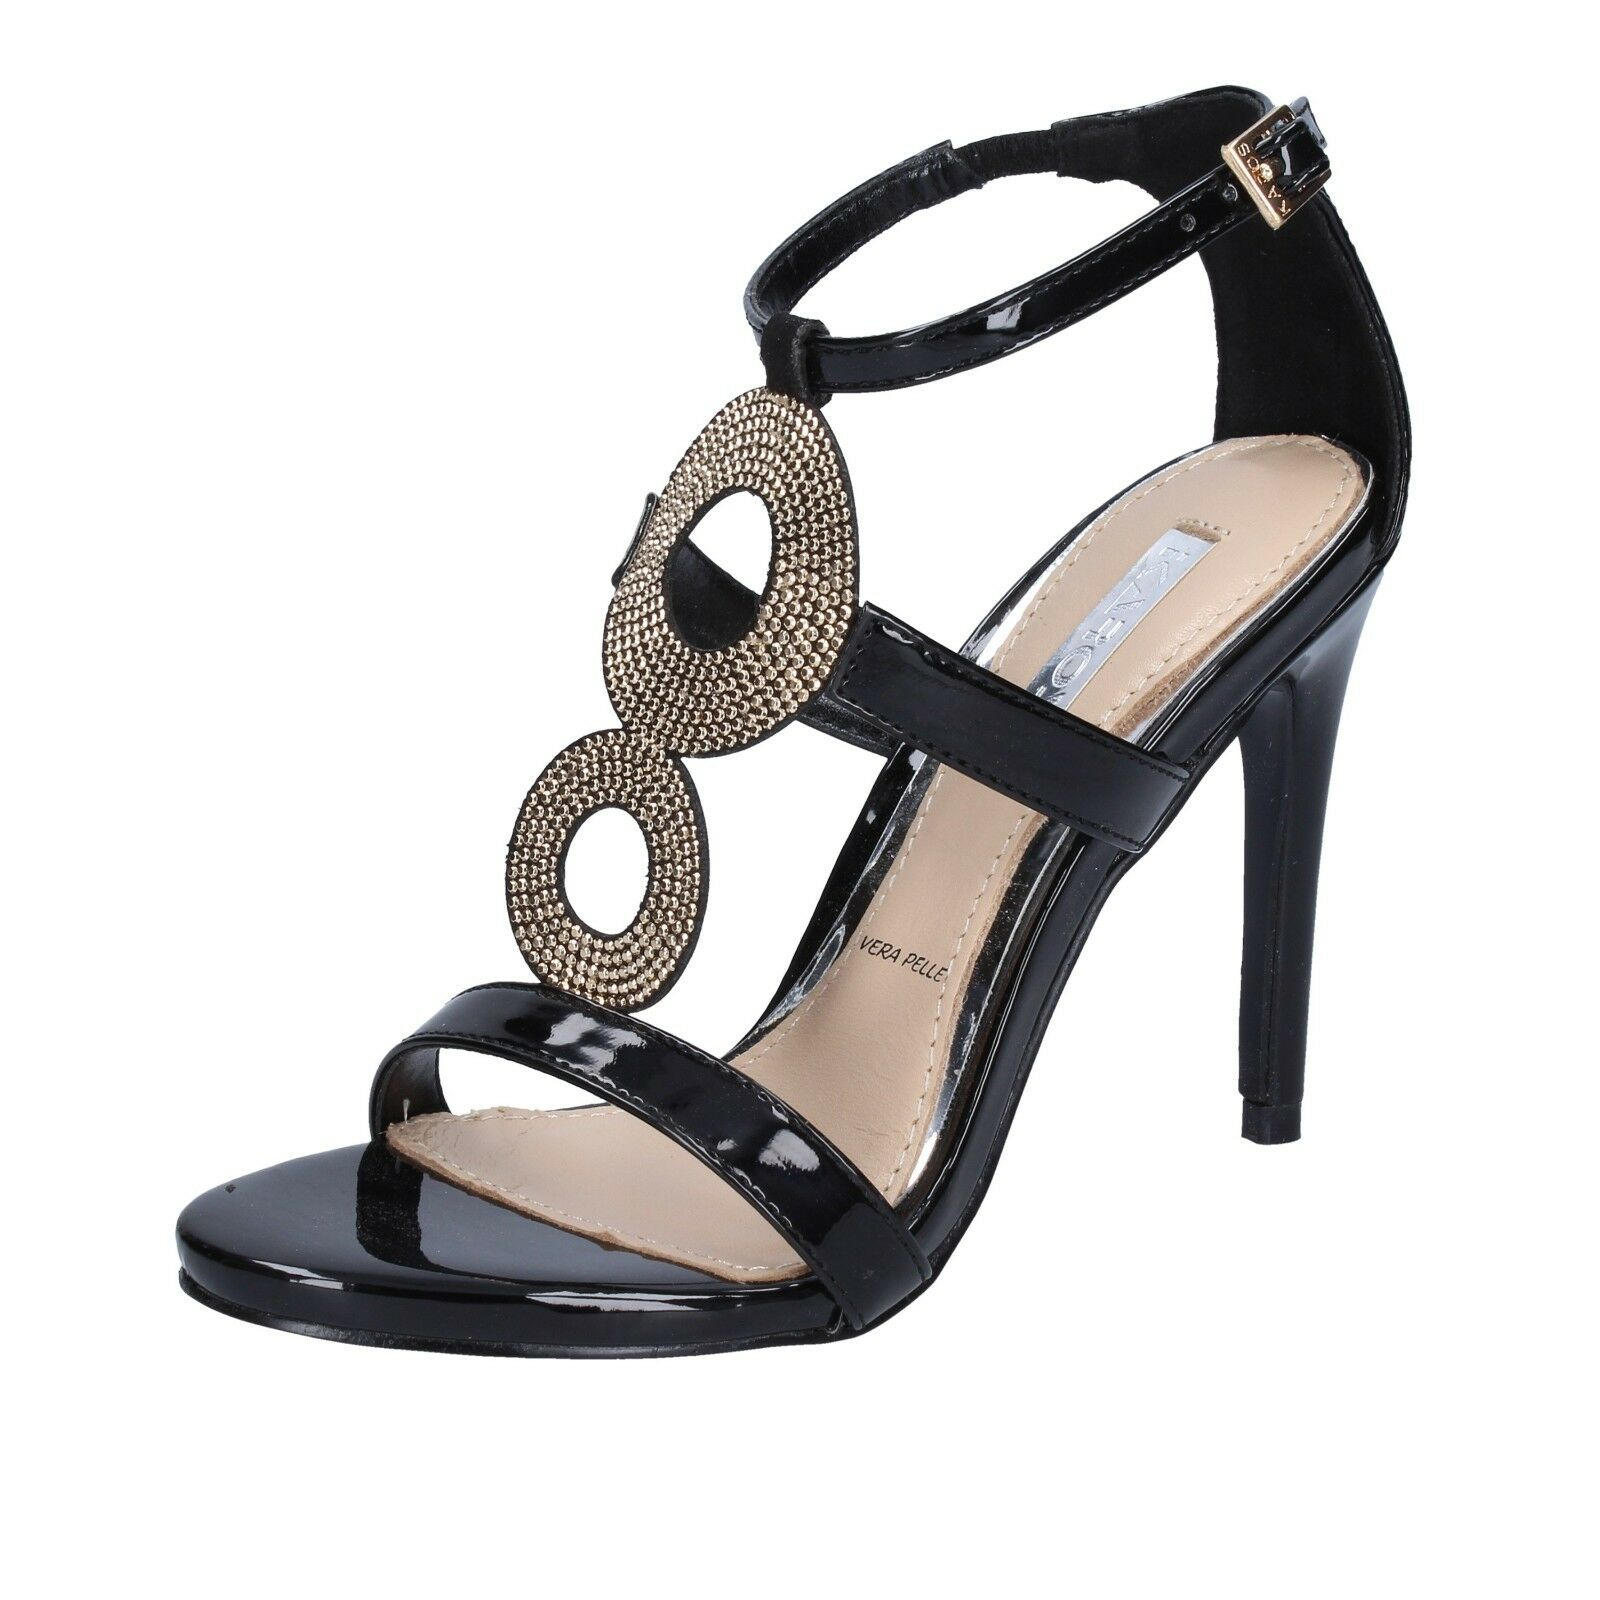 Women's shoes IKAROS 6 (EU 36) sandals black patent leather BT762-36